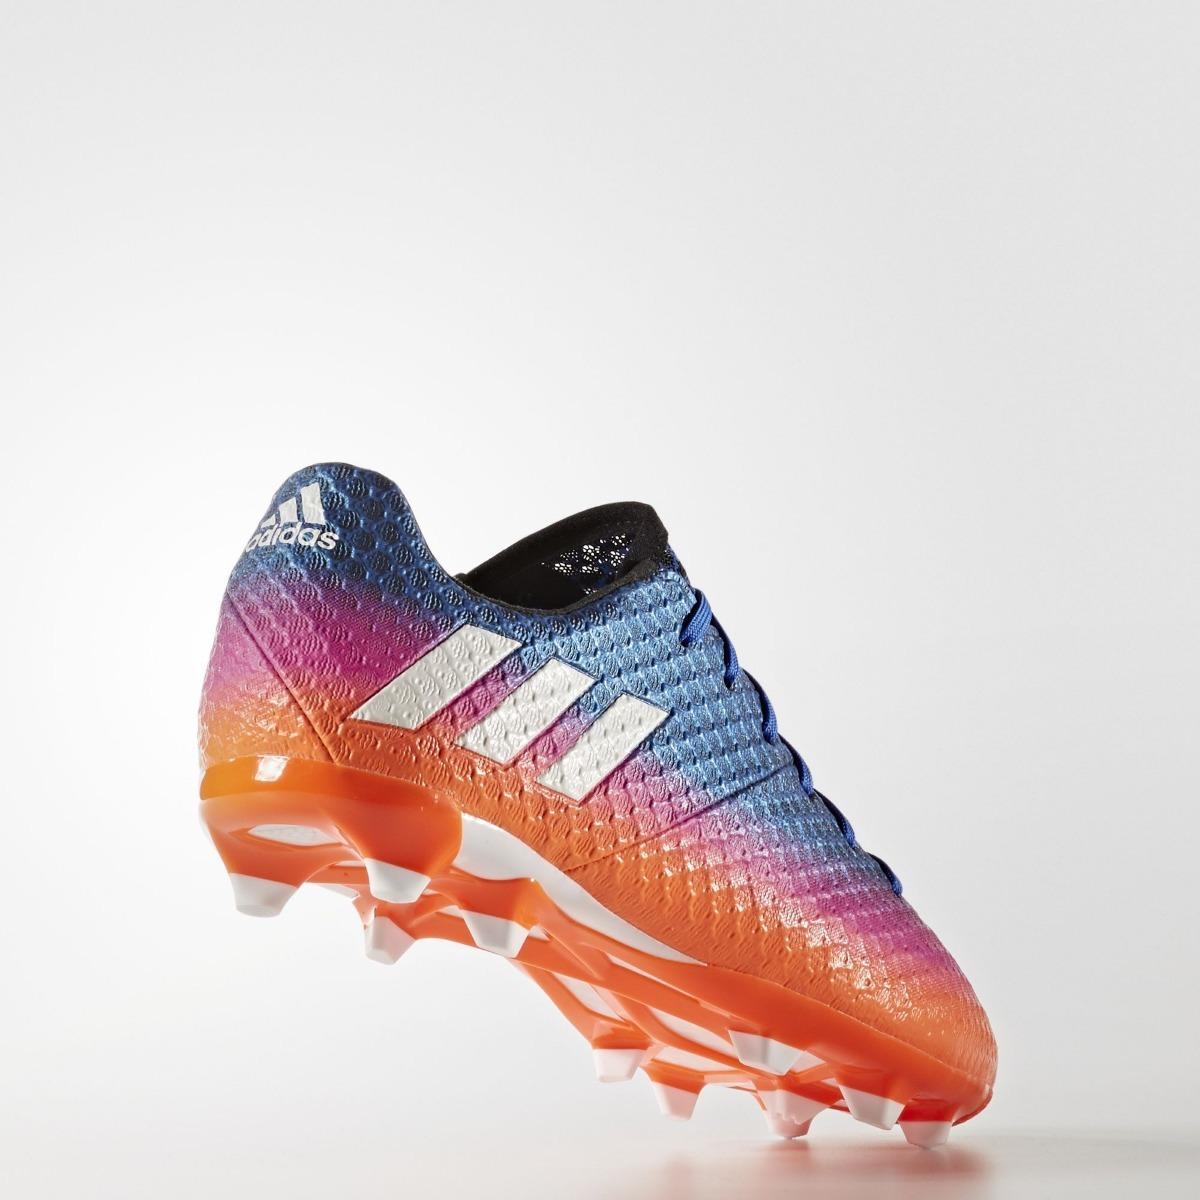 Adidas Ba9143 Messi Niño Zapatos Profesional Futbol No 16 1 7dd4qt8